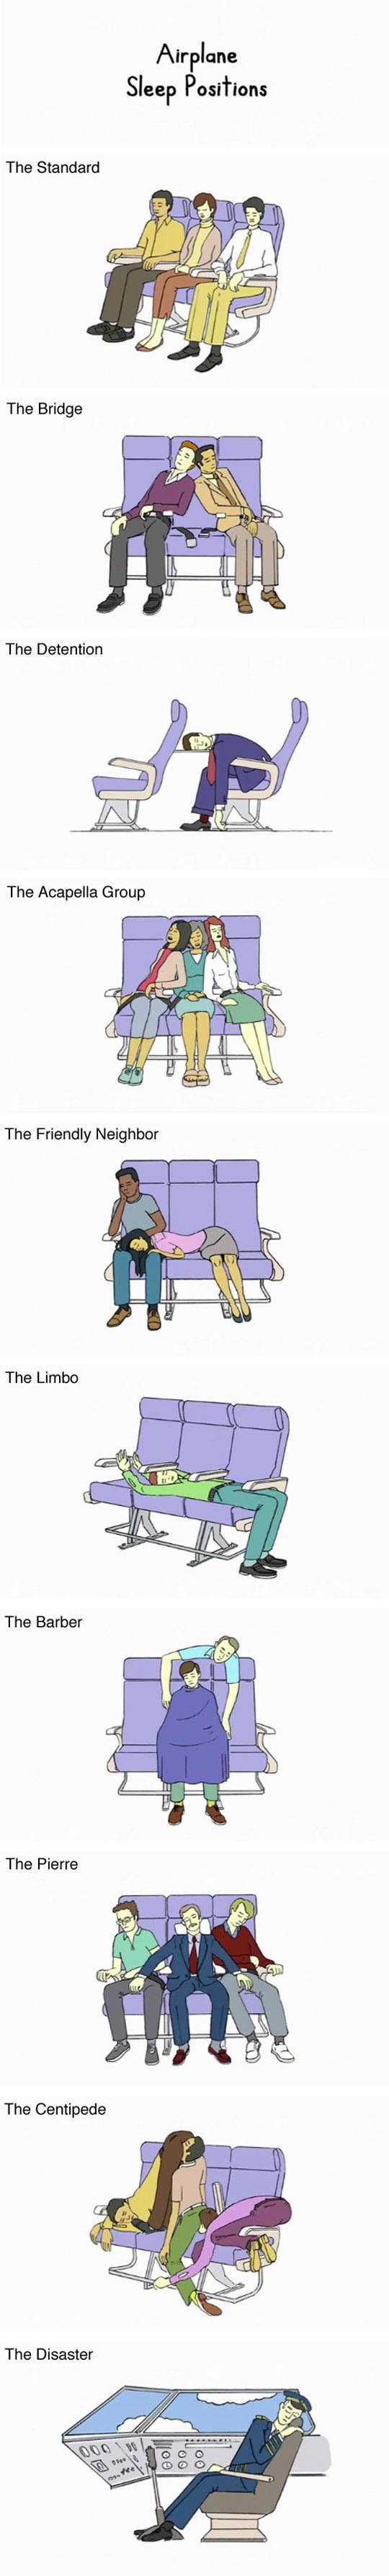 Airplane Sleep Positions